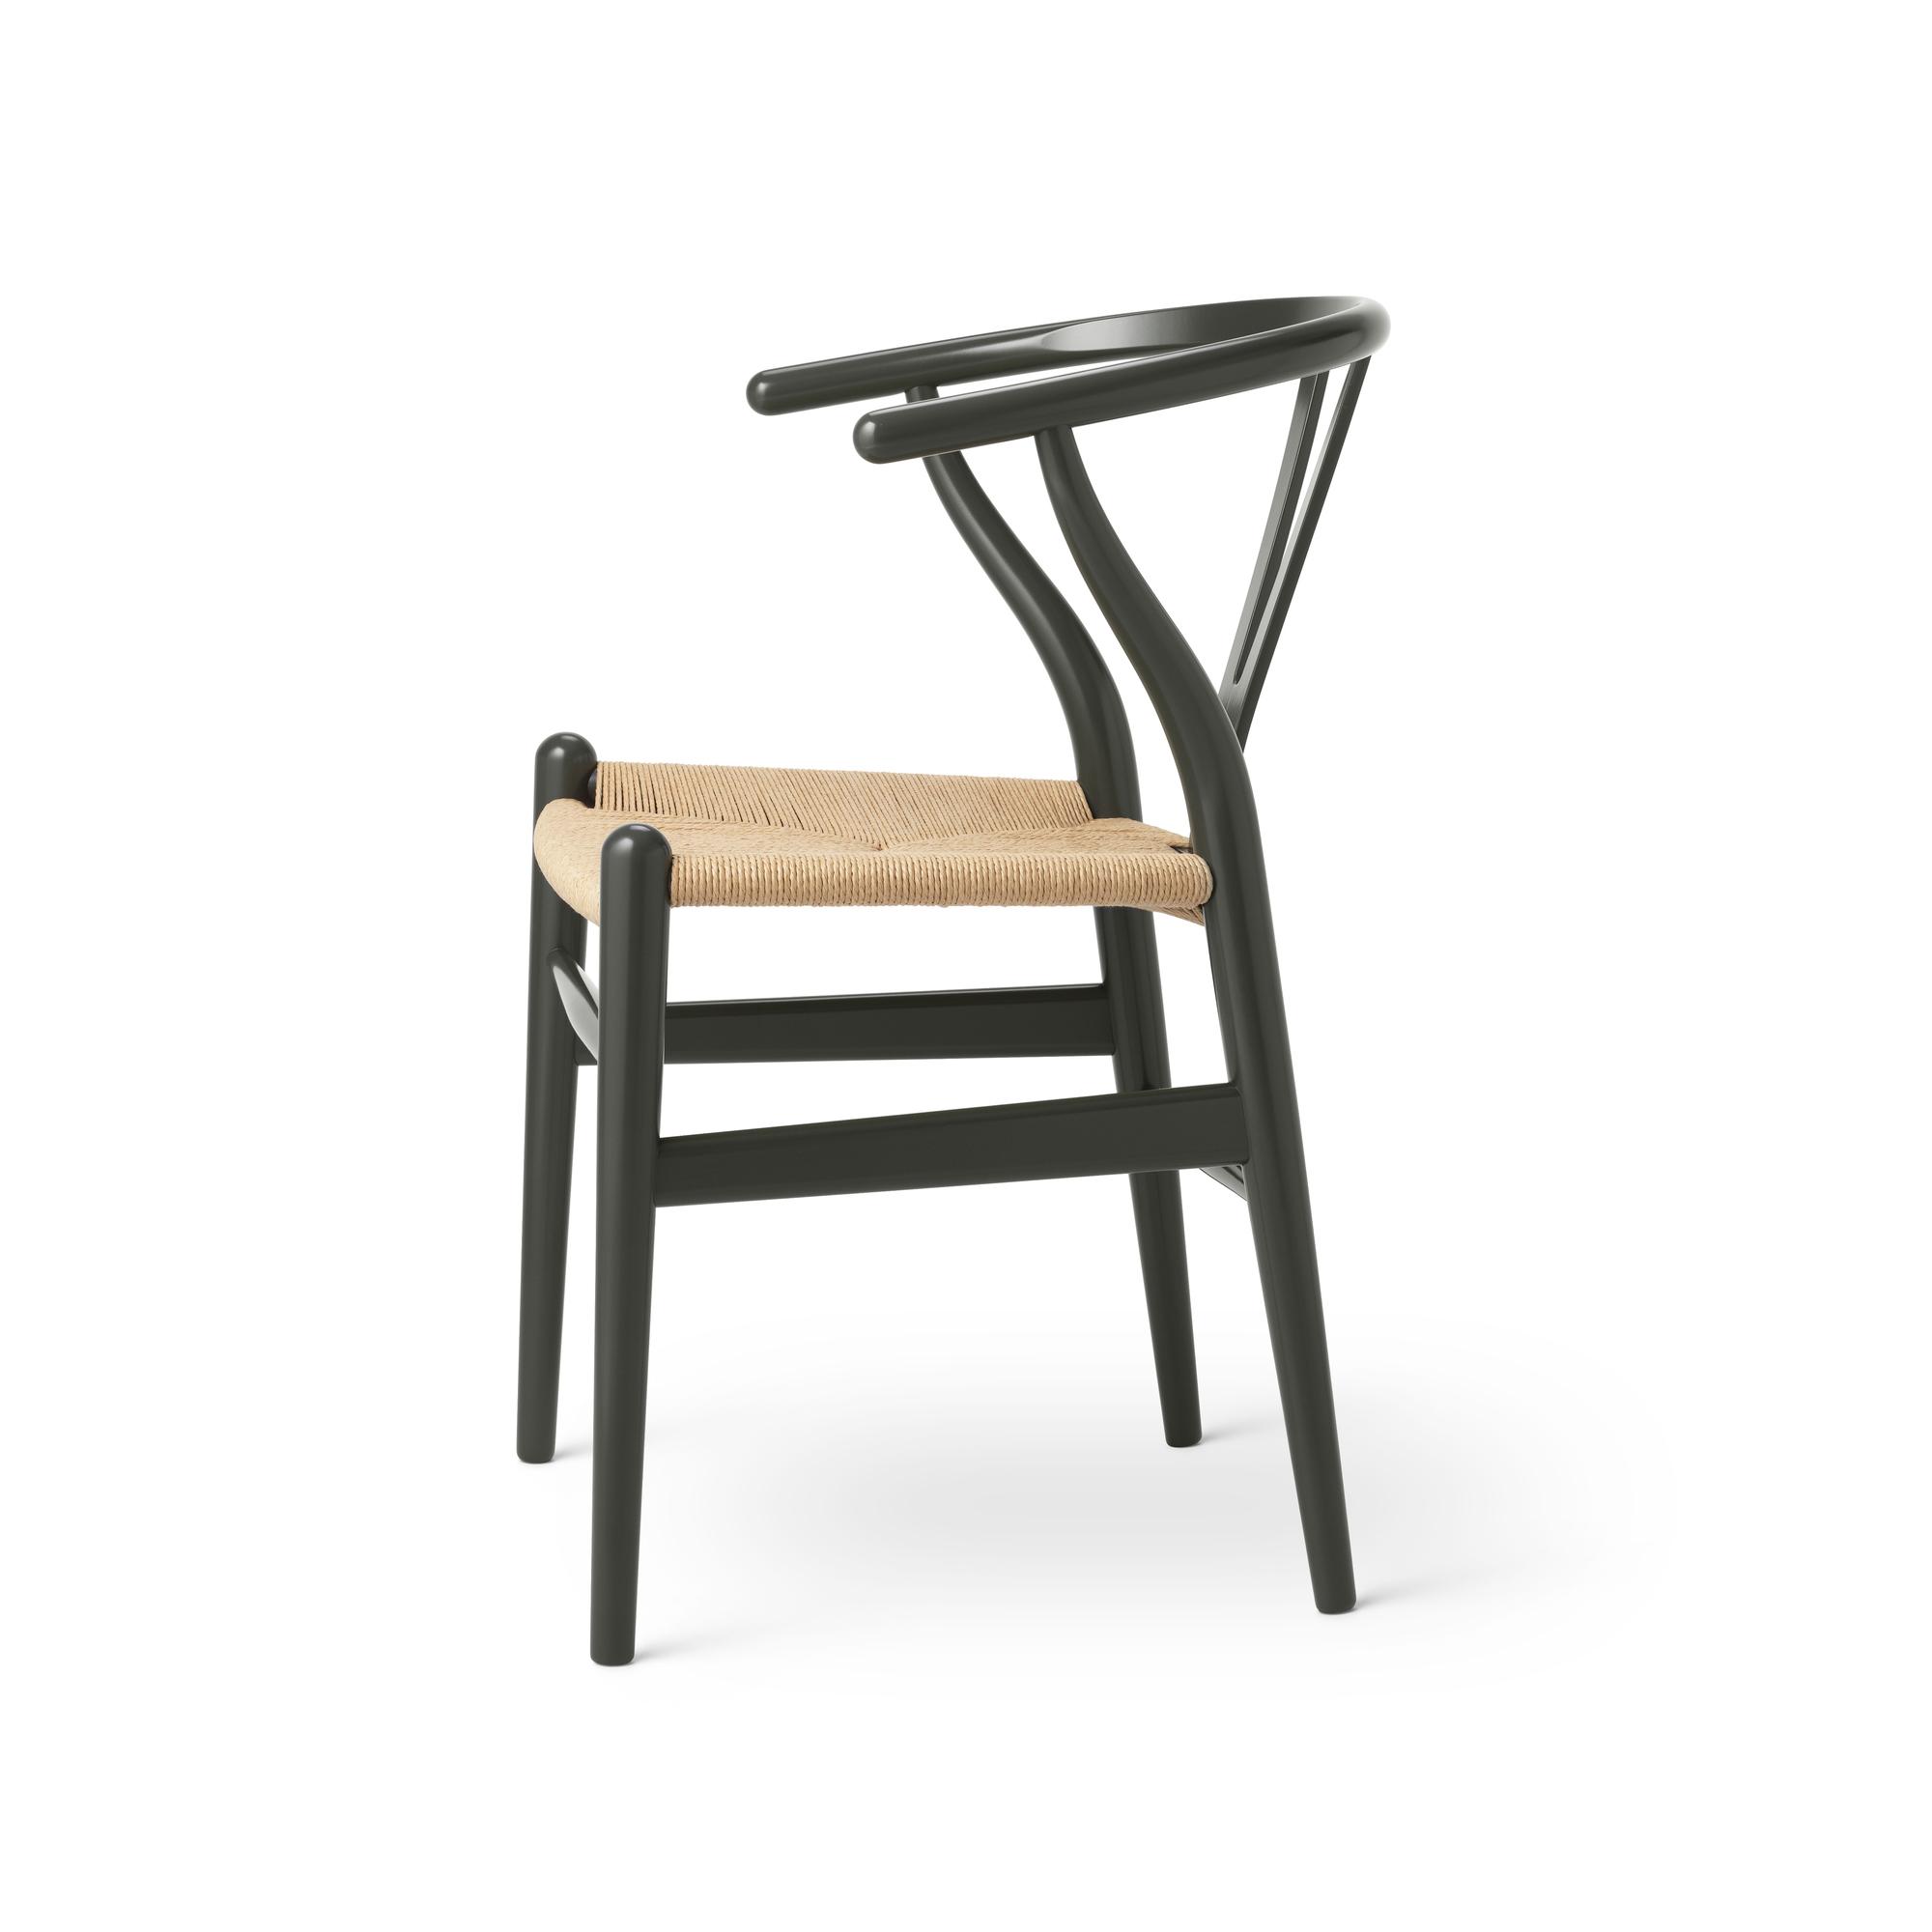 CH24 Wishbone Chair Harmony Deep Olive Carl Hansen & Søn